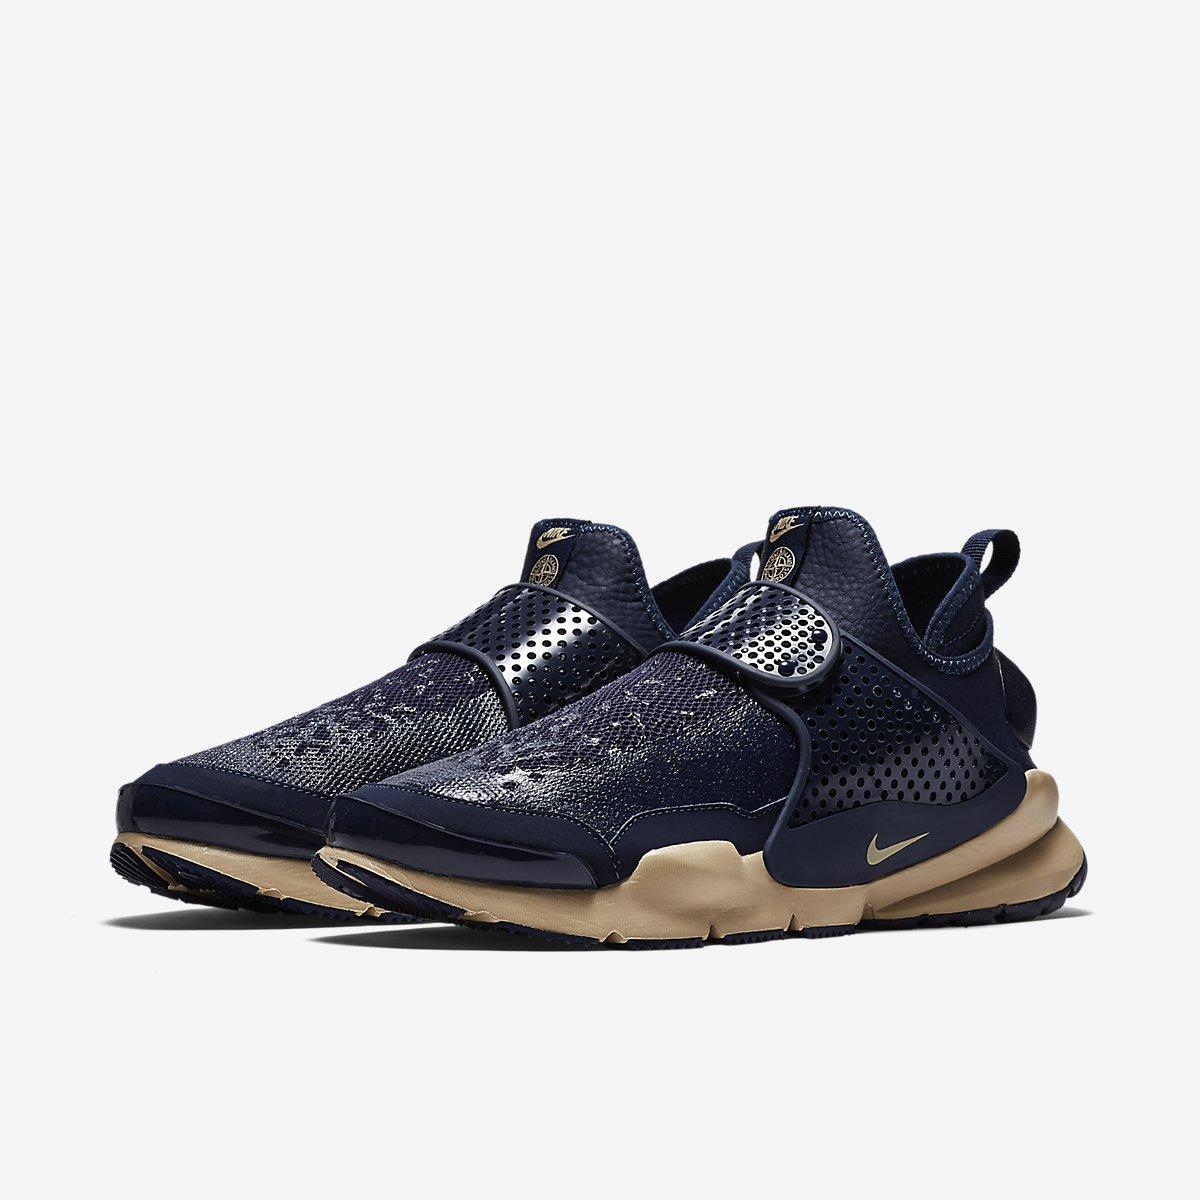 4a338b87d89 Stone Island x Nike Sock Dart MID – Sequoia